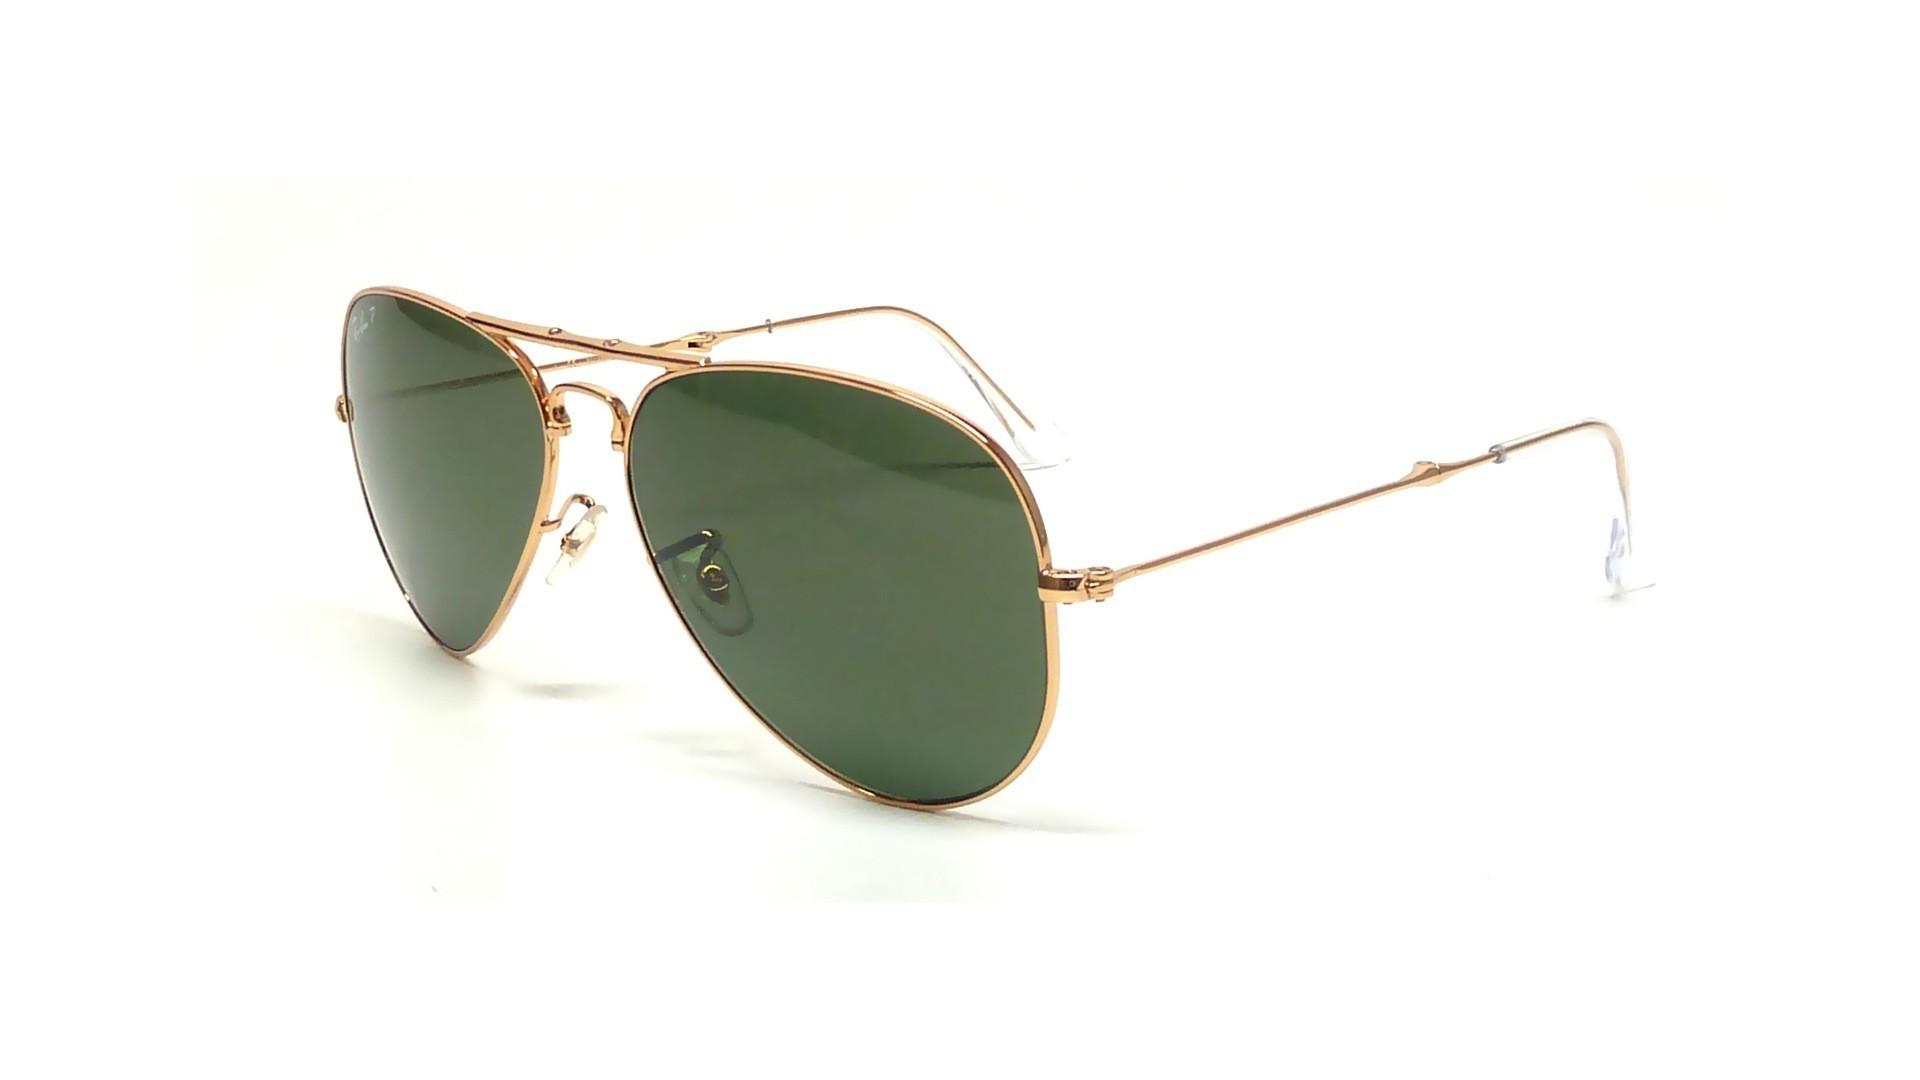 c0b9e6b5d46 Ray Ban Sunglasses Price List Pune « Heritage Malta